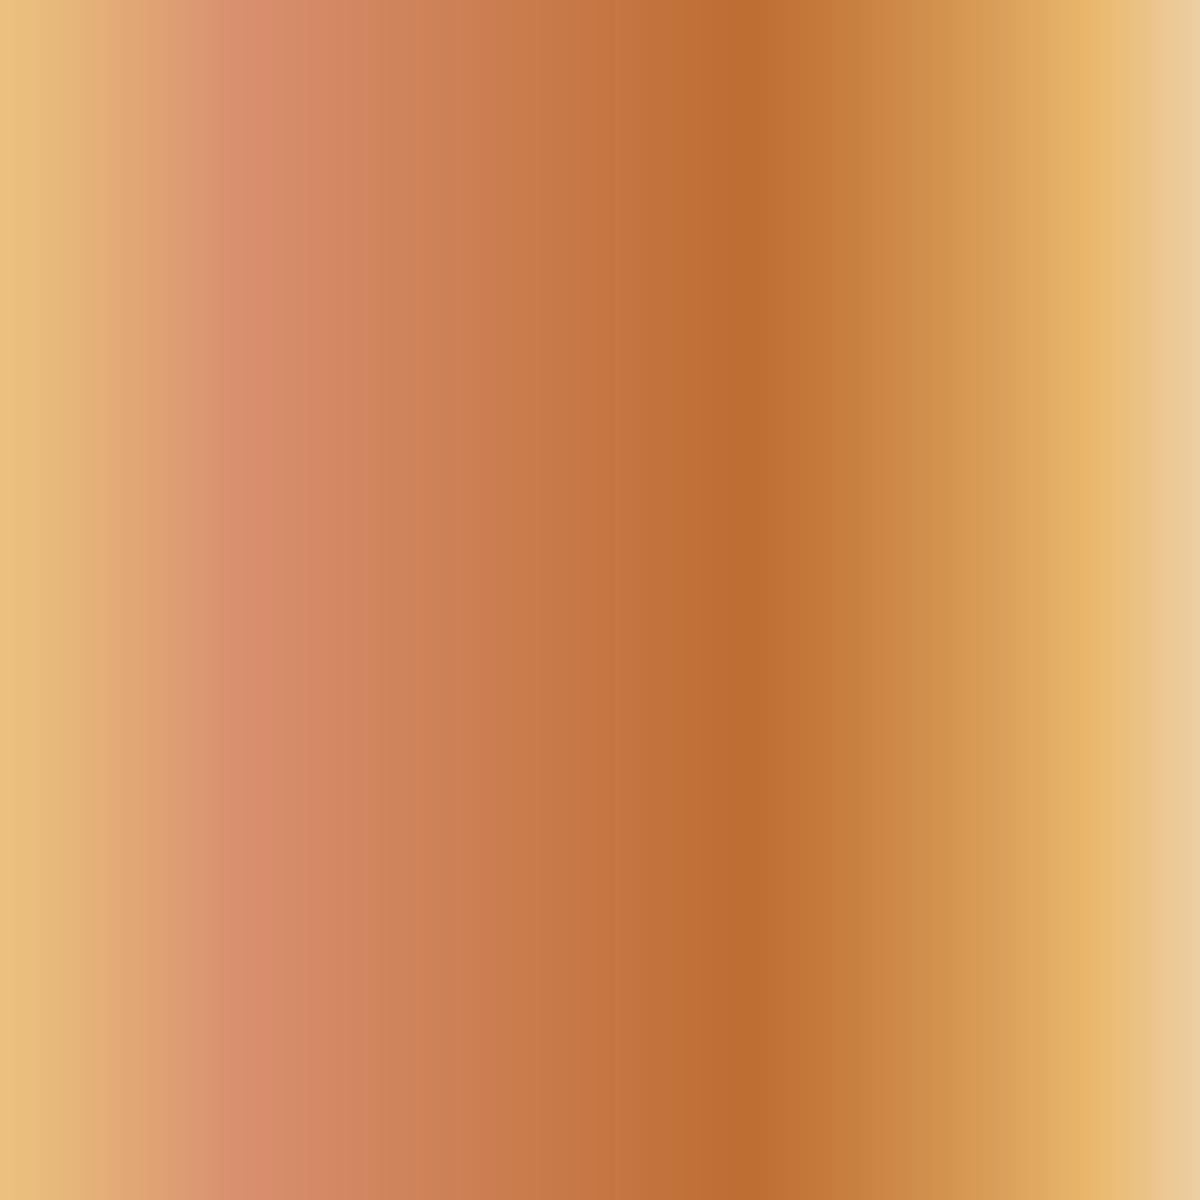 FolkArt ® Brushed Metal™ Acrylic Paint - Rose Gold, 2 oz.